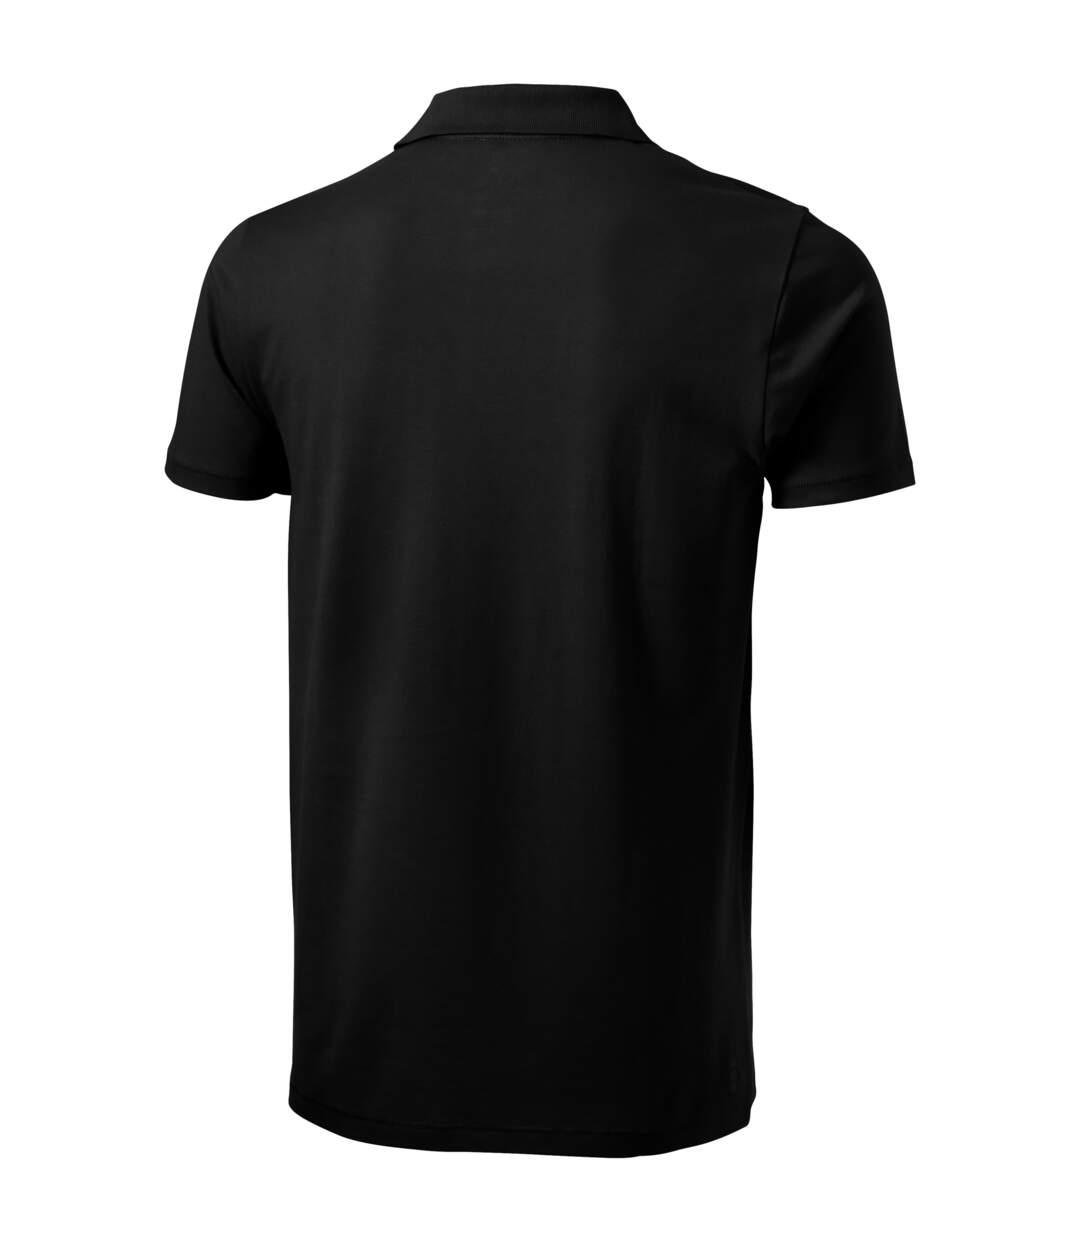 Elevate Mens Seller Short Sleeve Polo (Solid Black) - UTPF1825